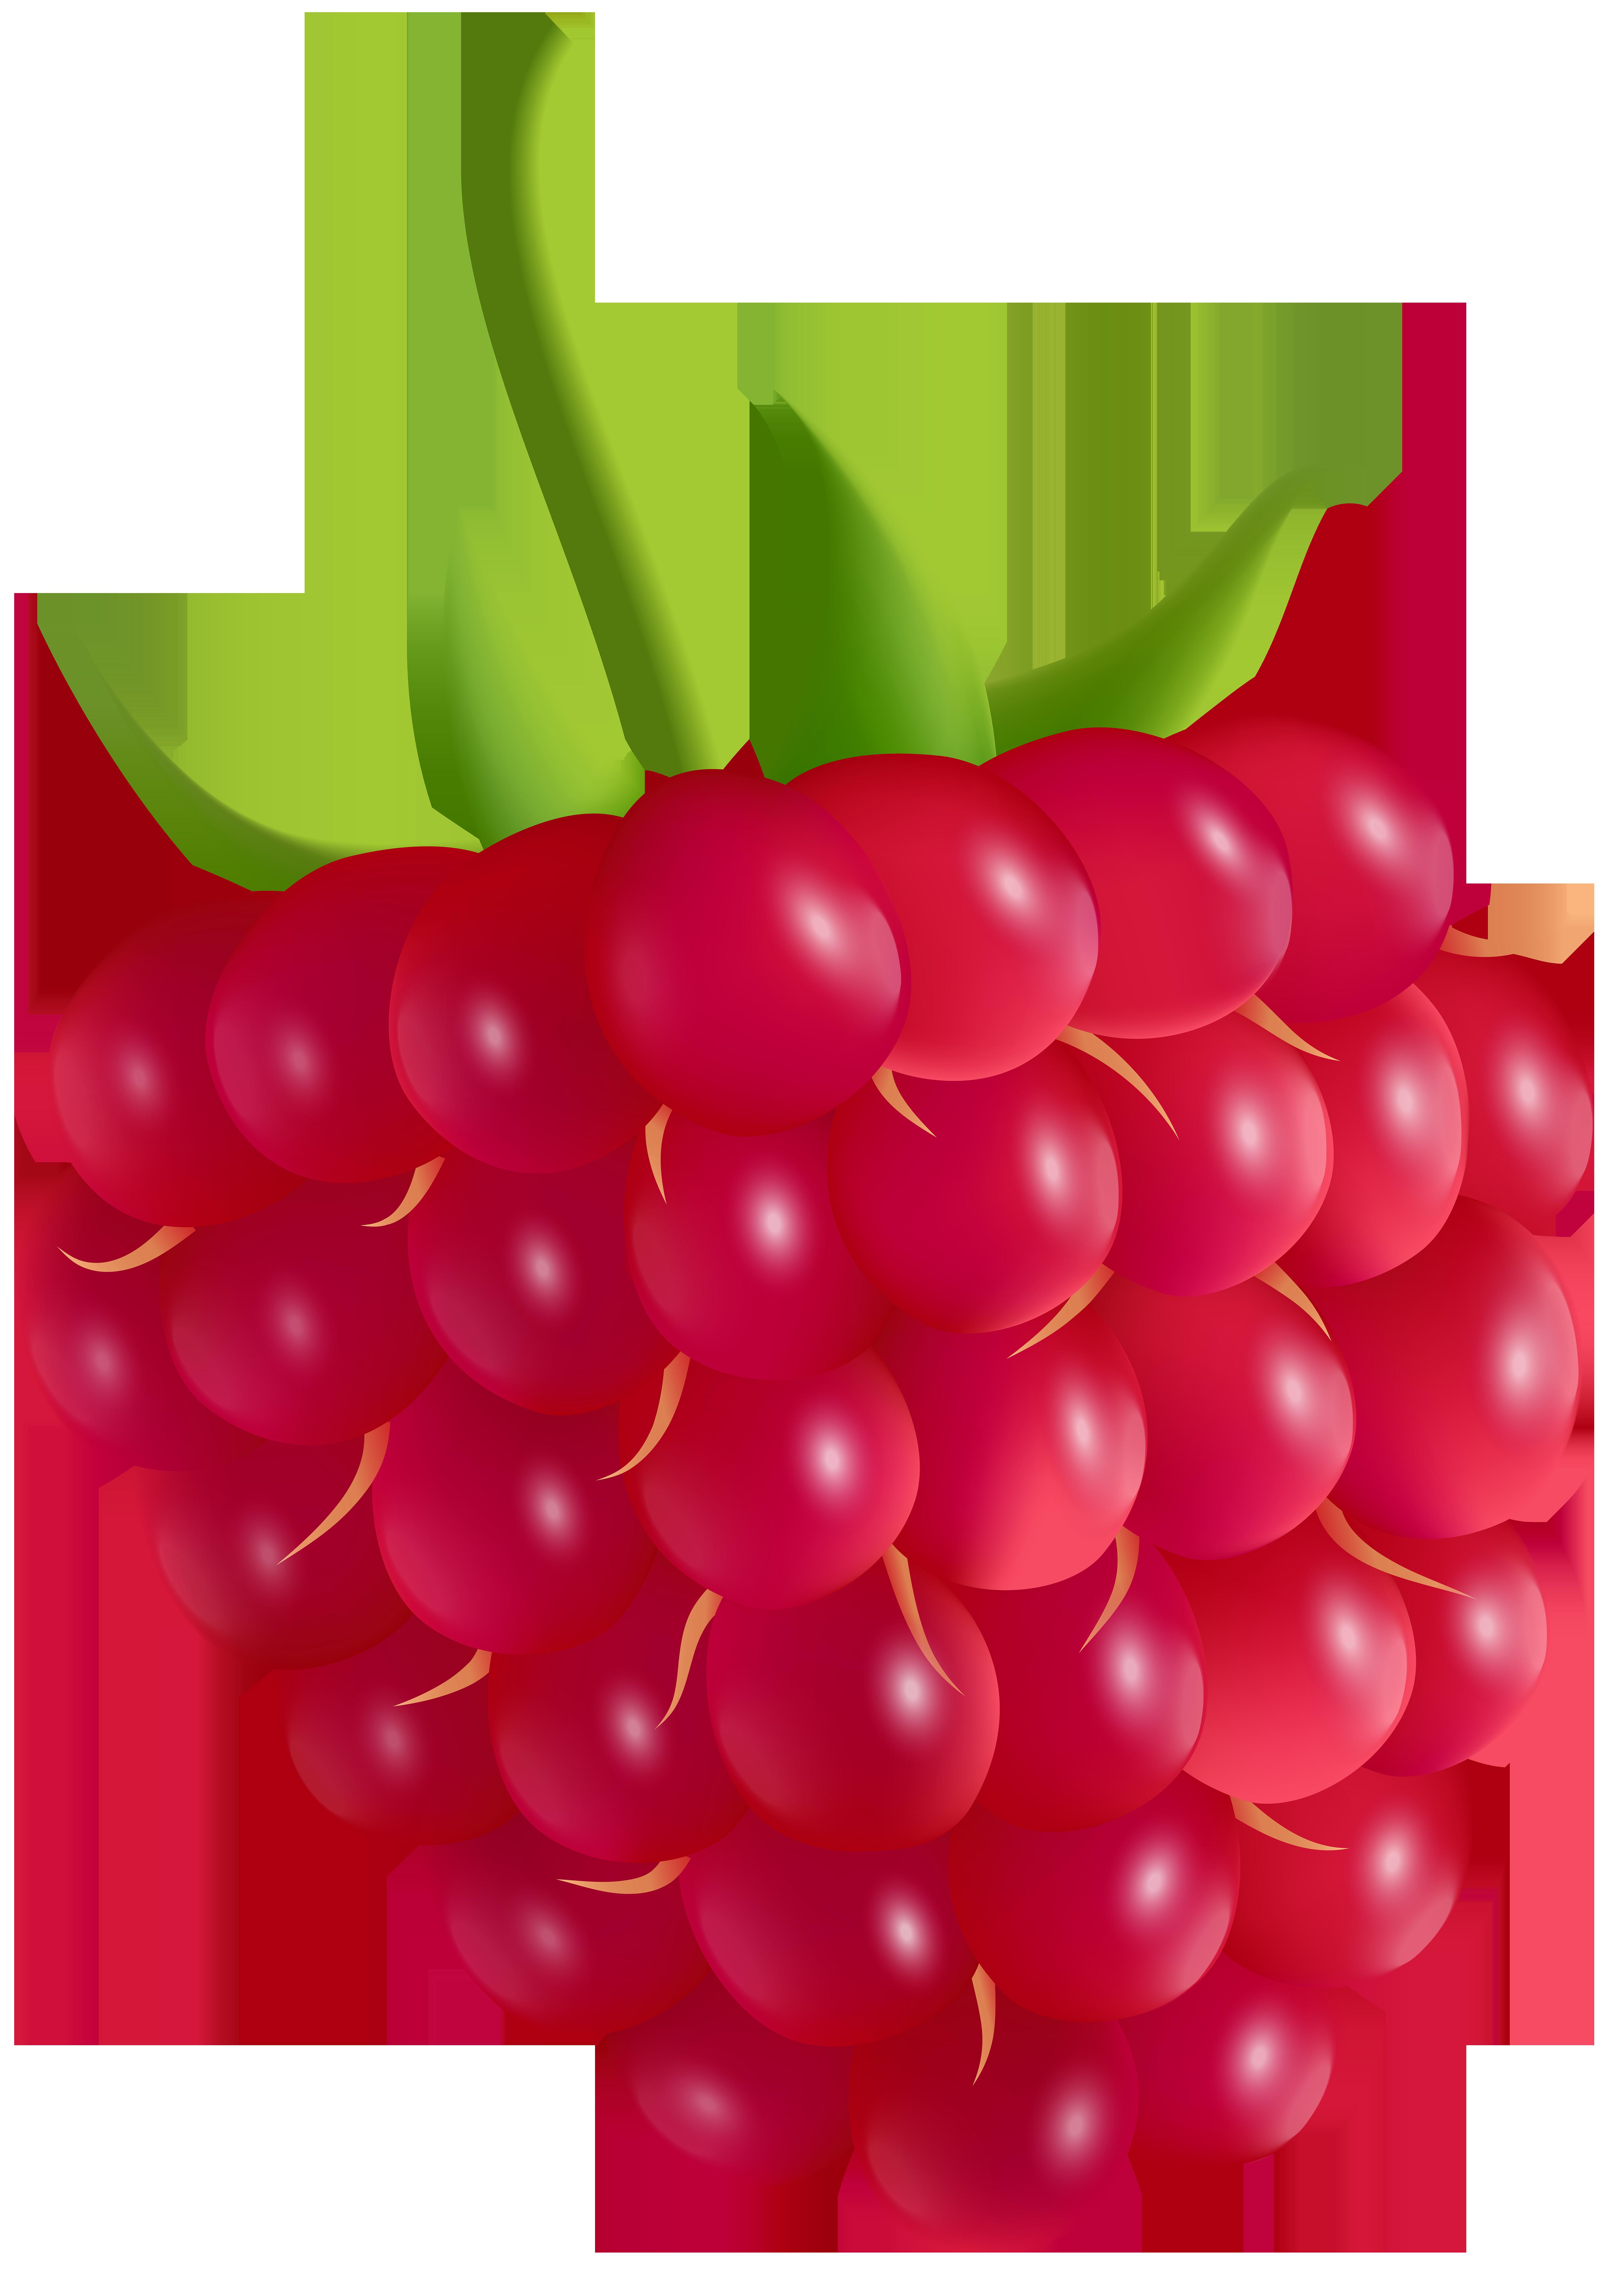 5726x8000 Raspberry Transparent Png Clip Art Imageu200b Gallery Yopriceville